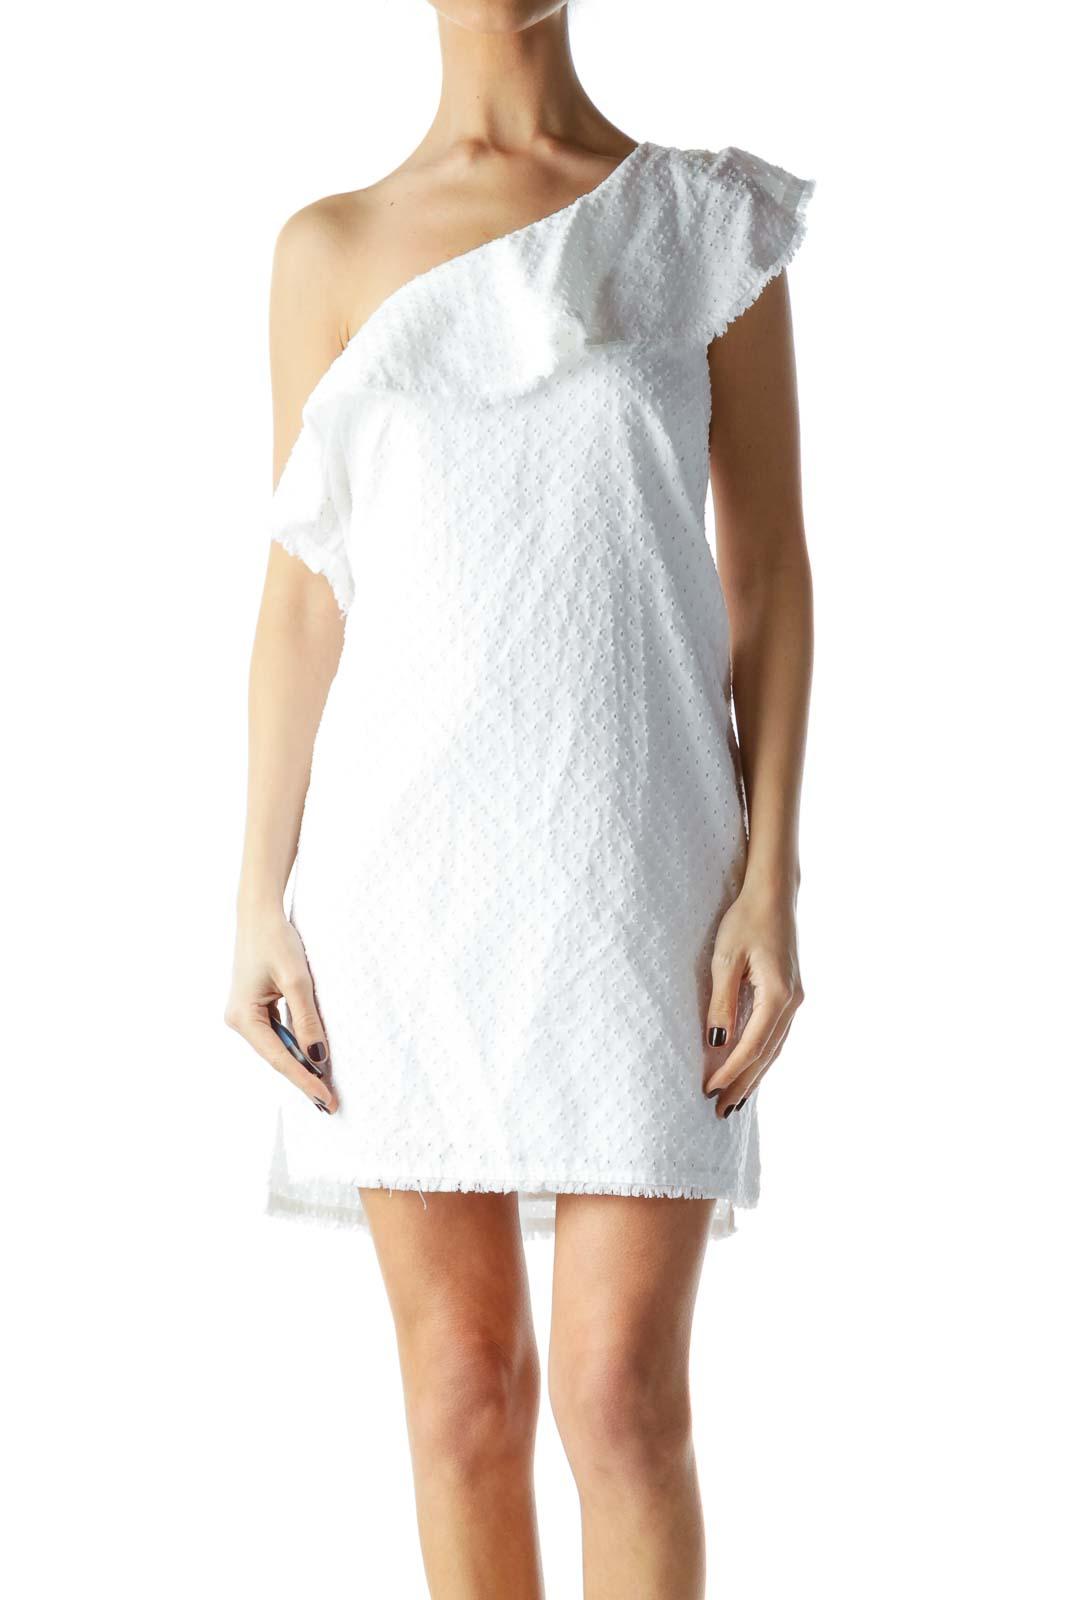 White One-Shoulder Knit Dress Front